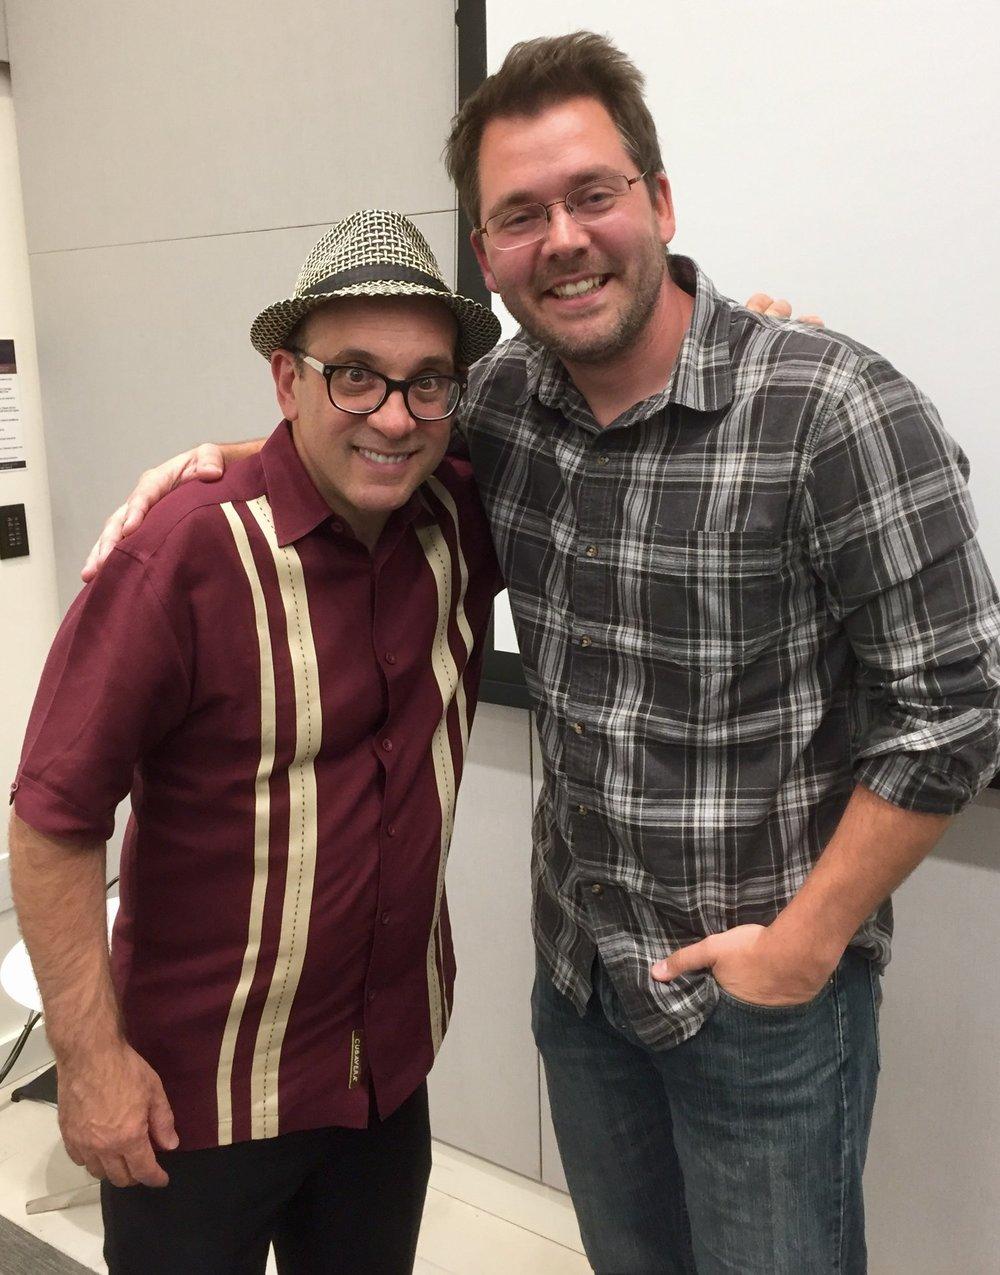 Cal Fussman (left) and Austin Meyermann (right)